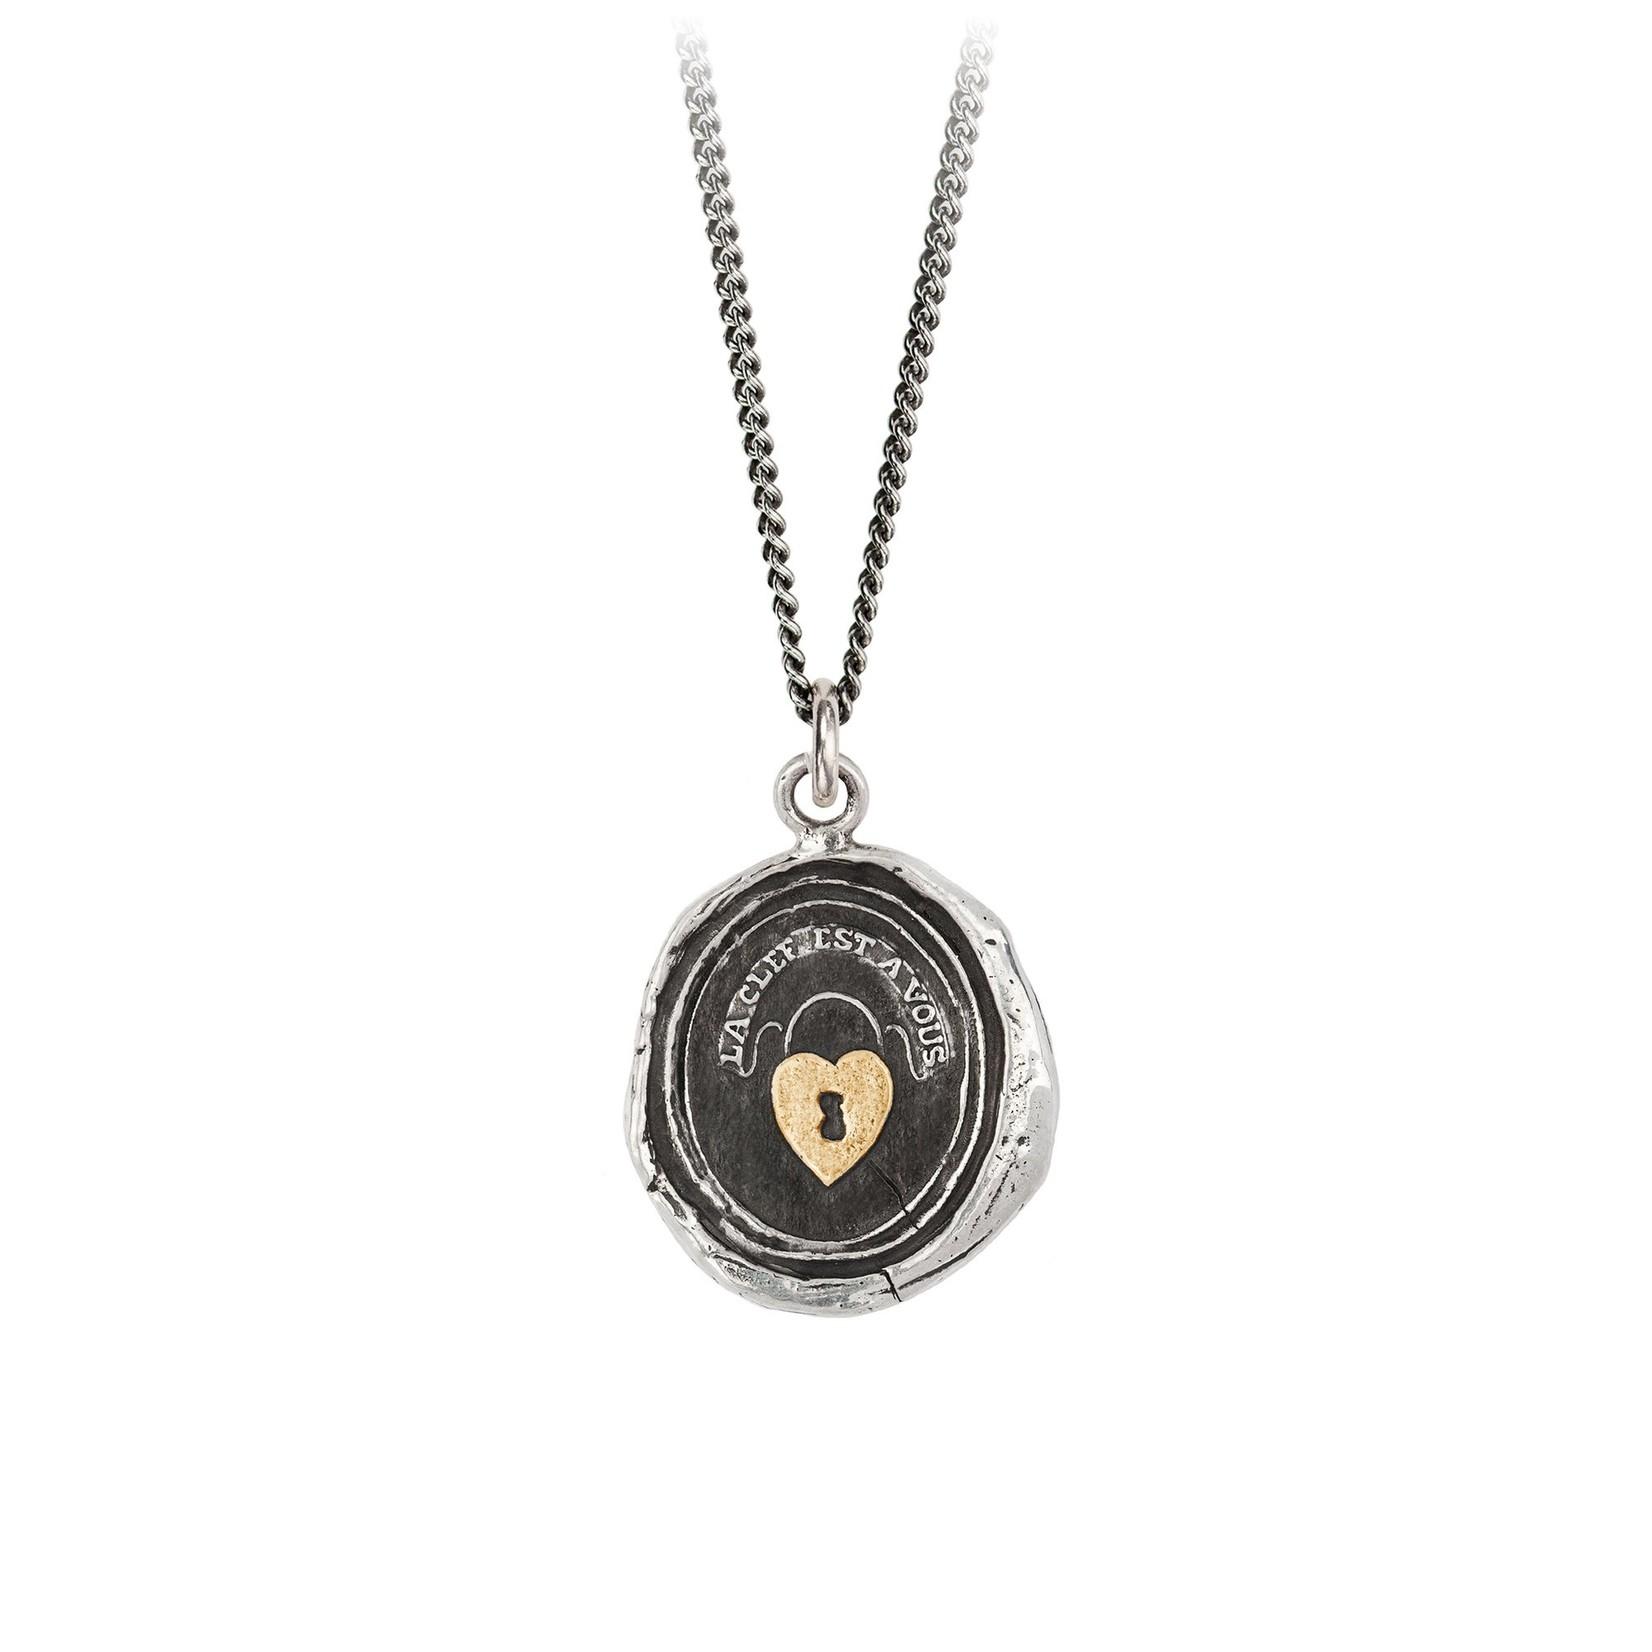 Pyrrha Heart Lock 14k Gold On Silver Talisman